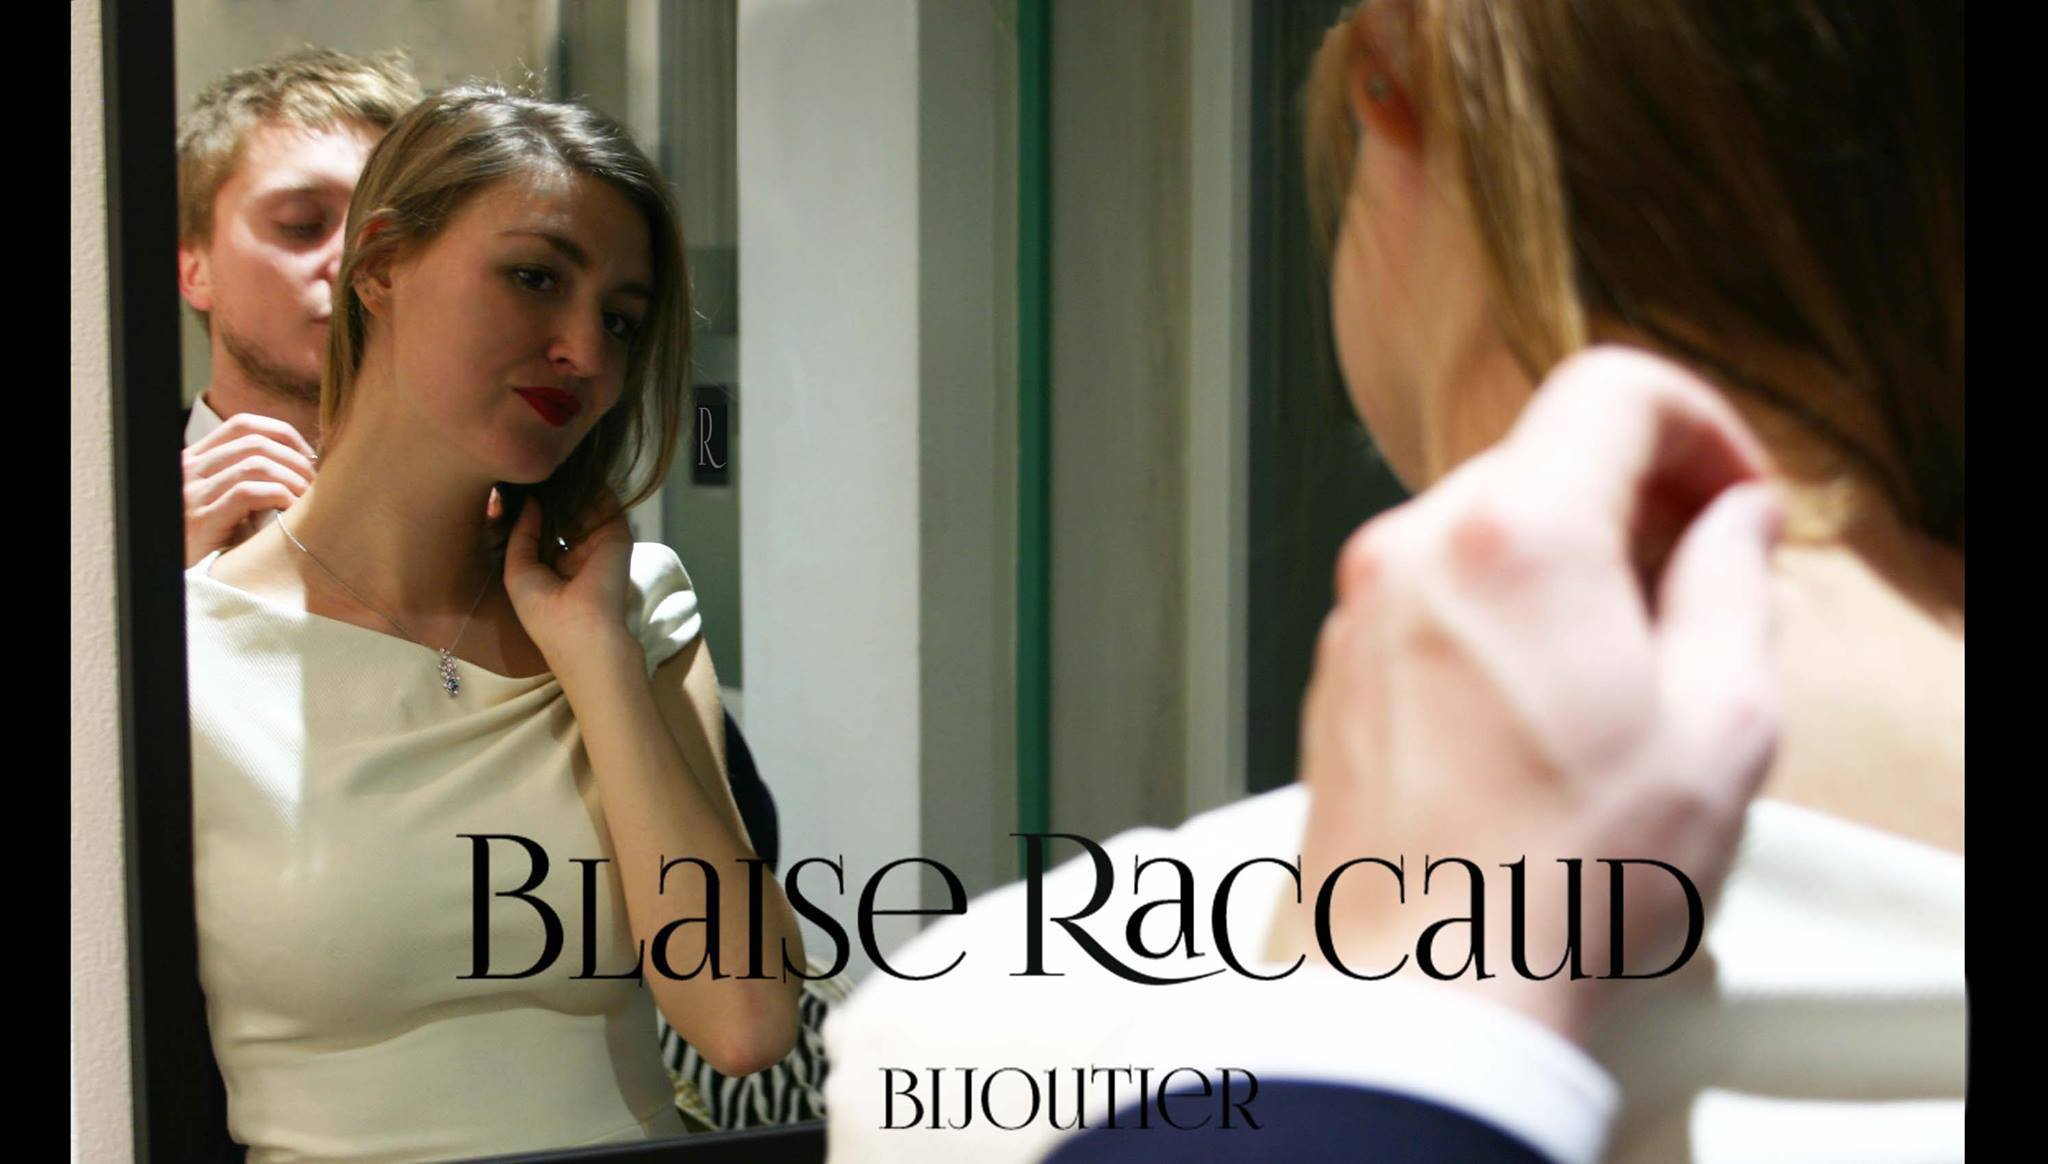 Blaise Raccaud Bijoutier